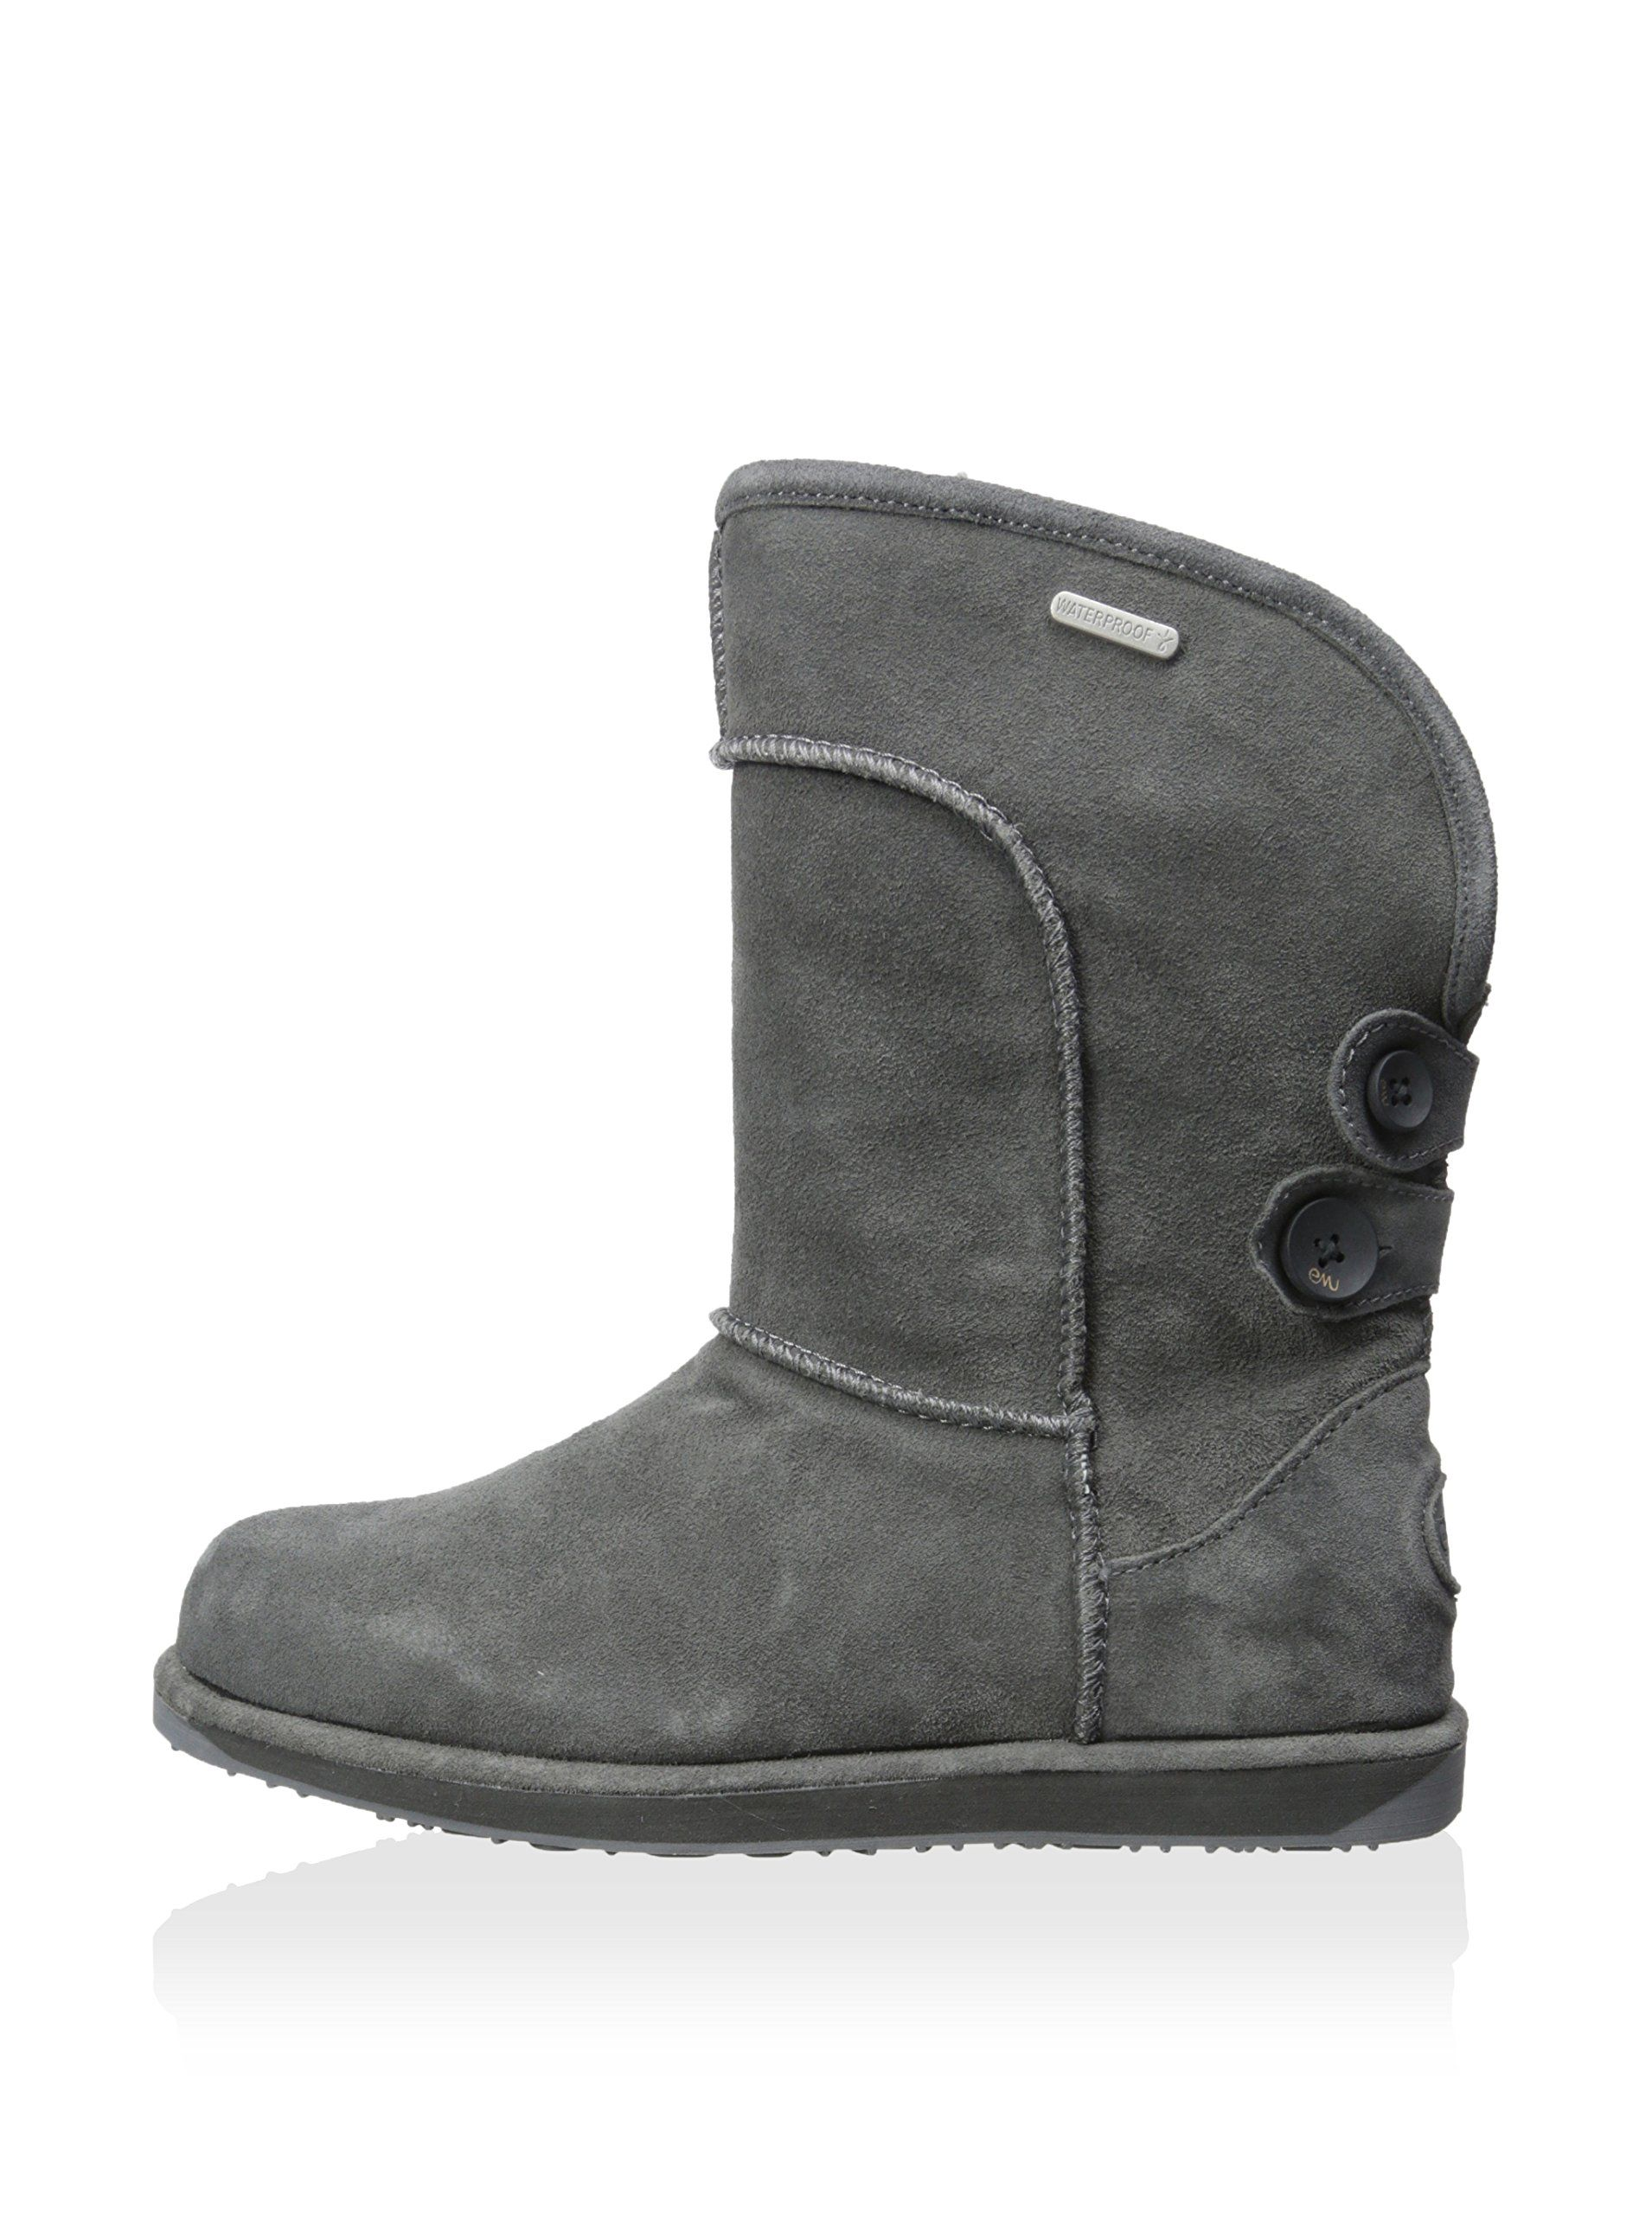 Emu Womens Black Boots Charlotte